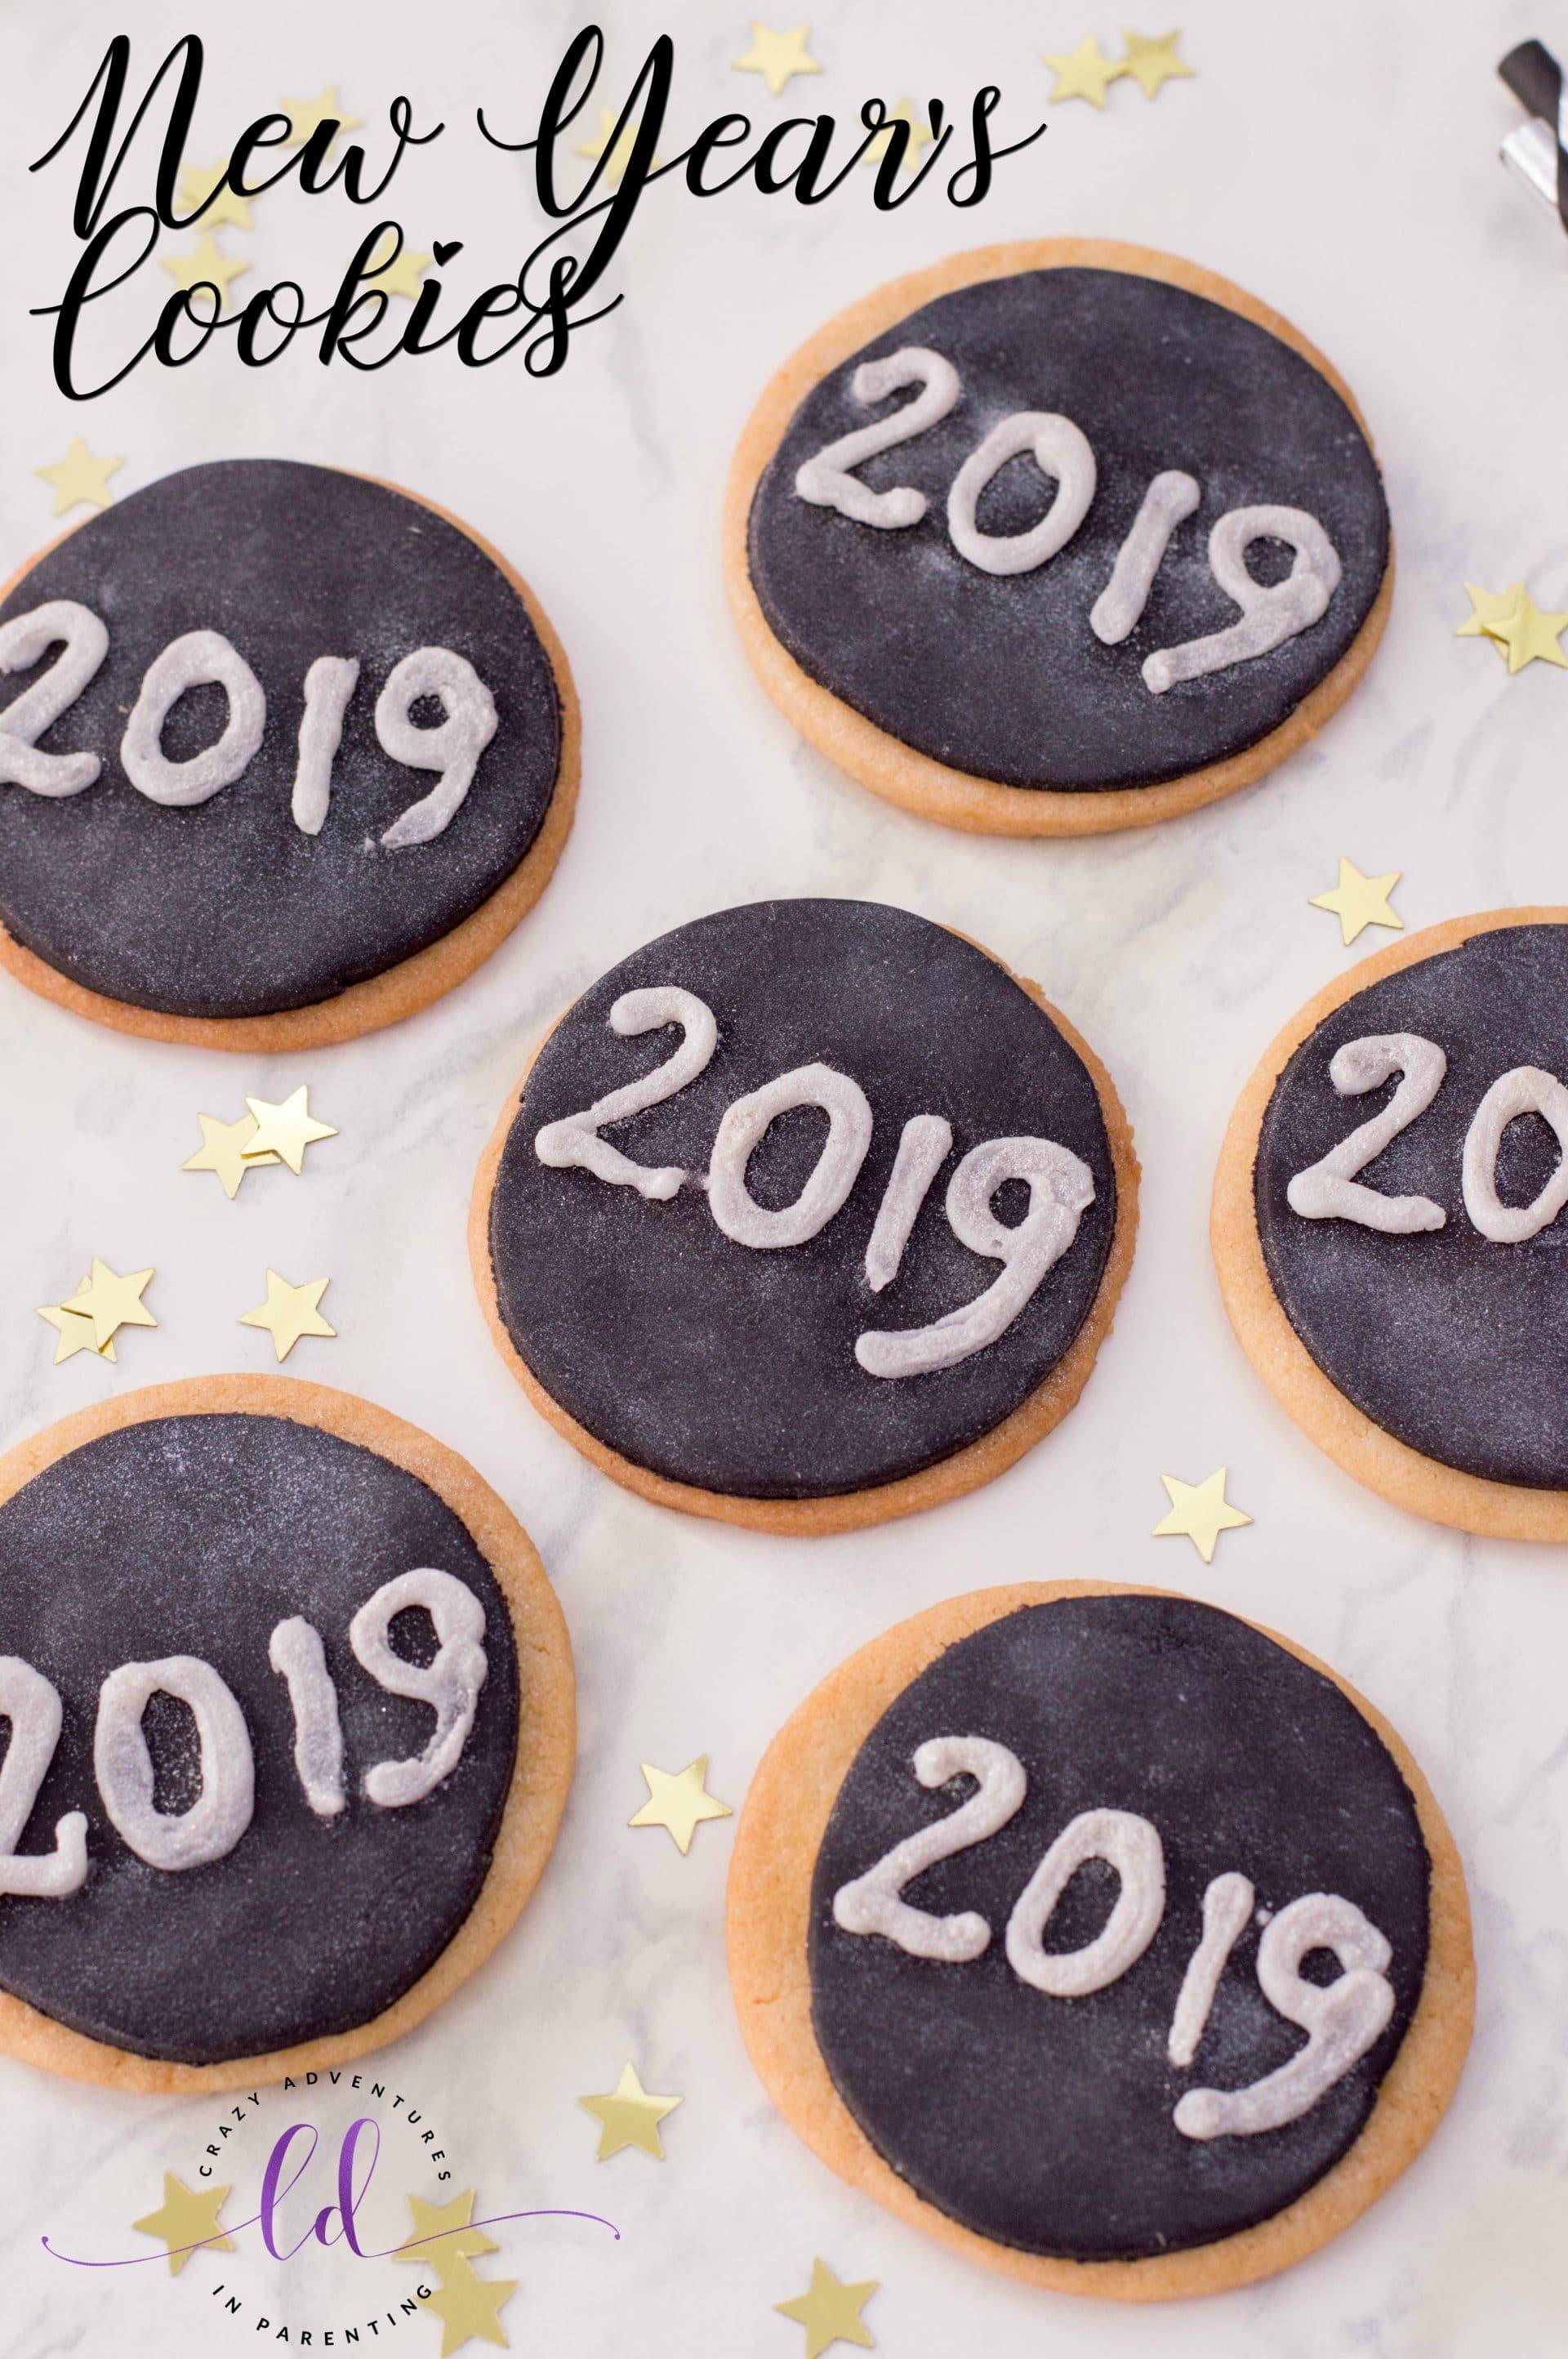 Glitter New Year's Cookies Recipe